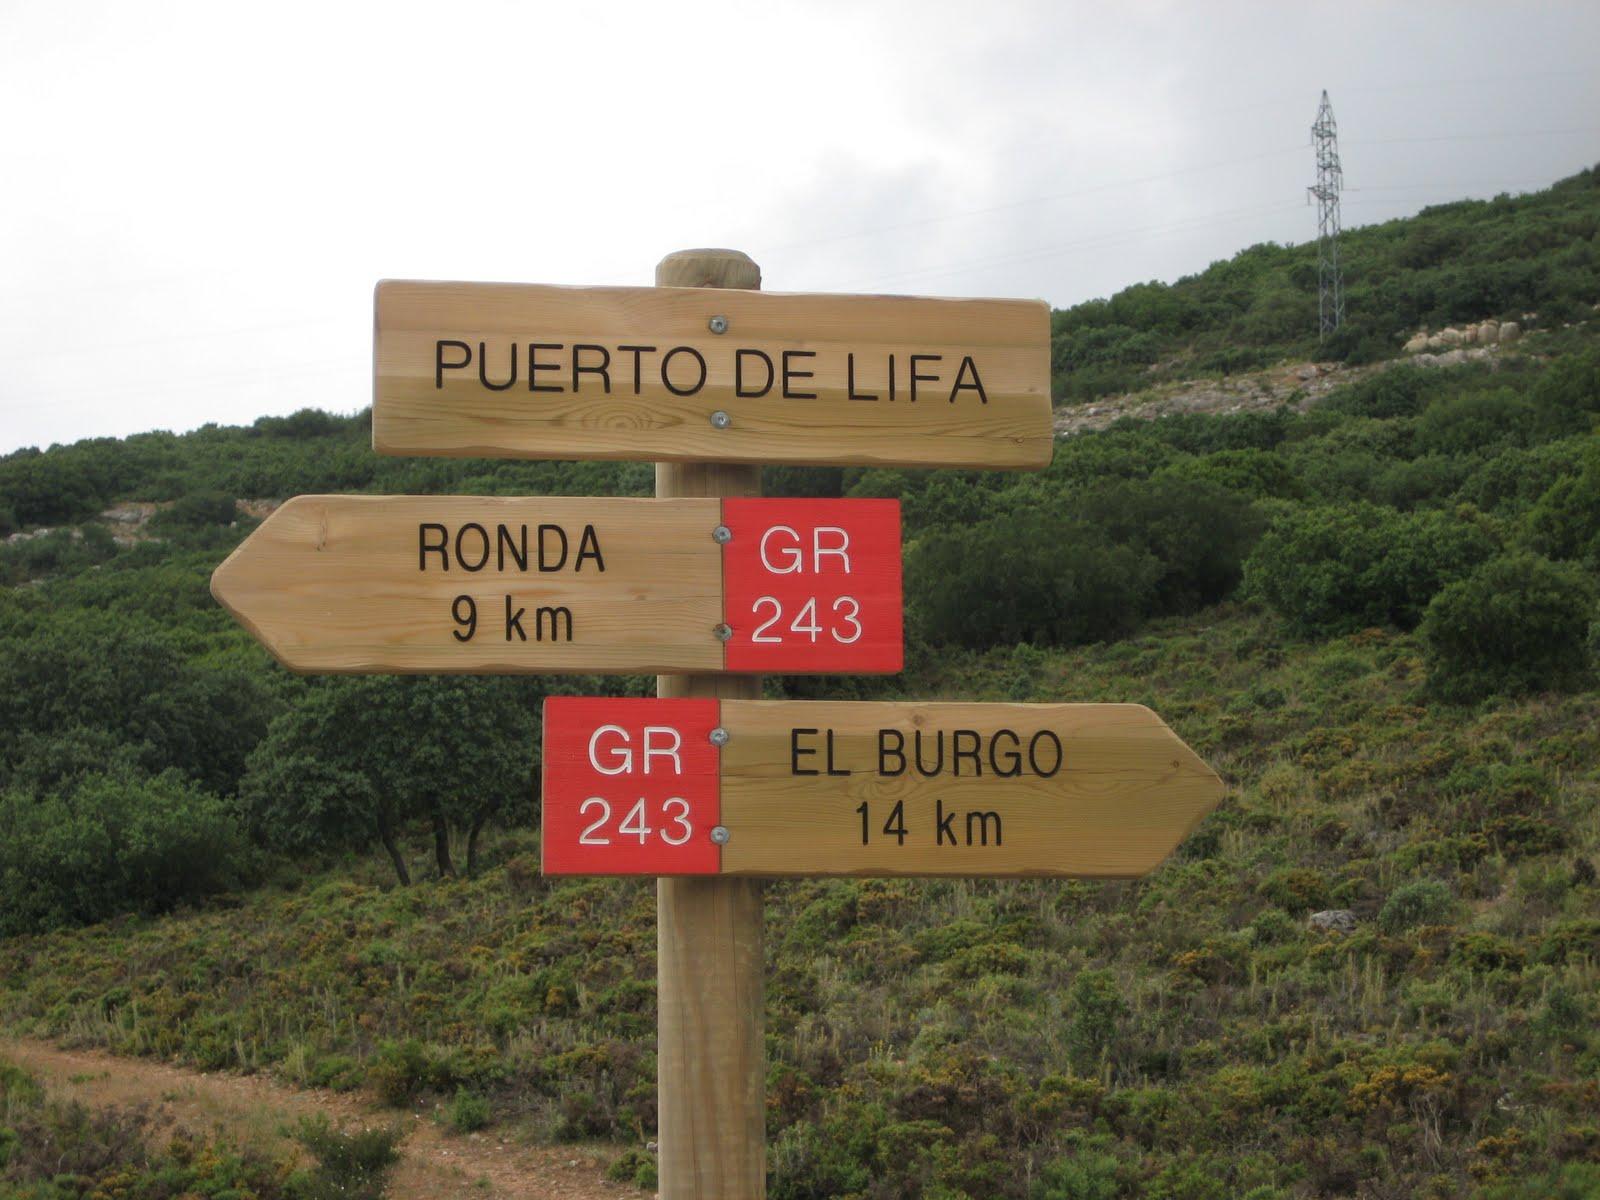 Sierra de las Nieves Trail - GR 243